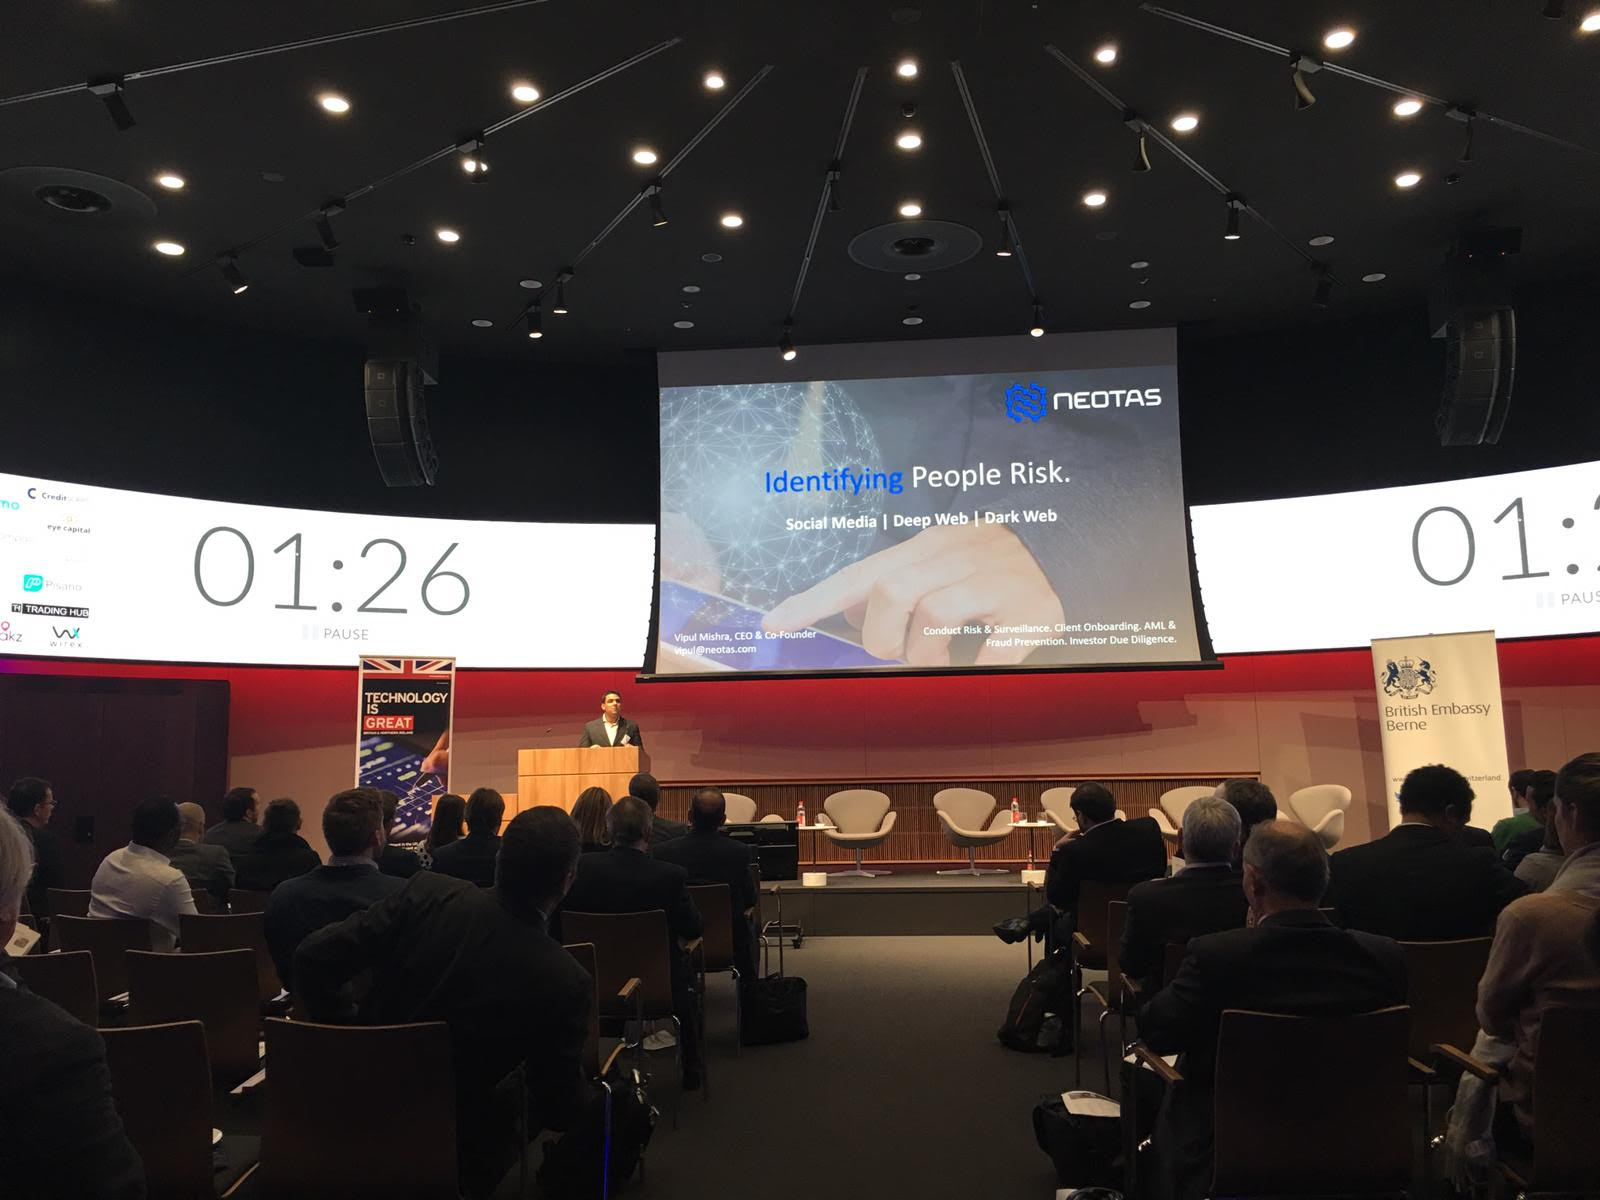 fintech smartbizhub manuela andaloro